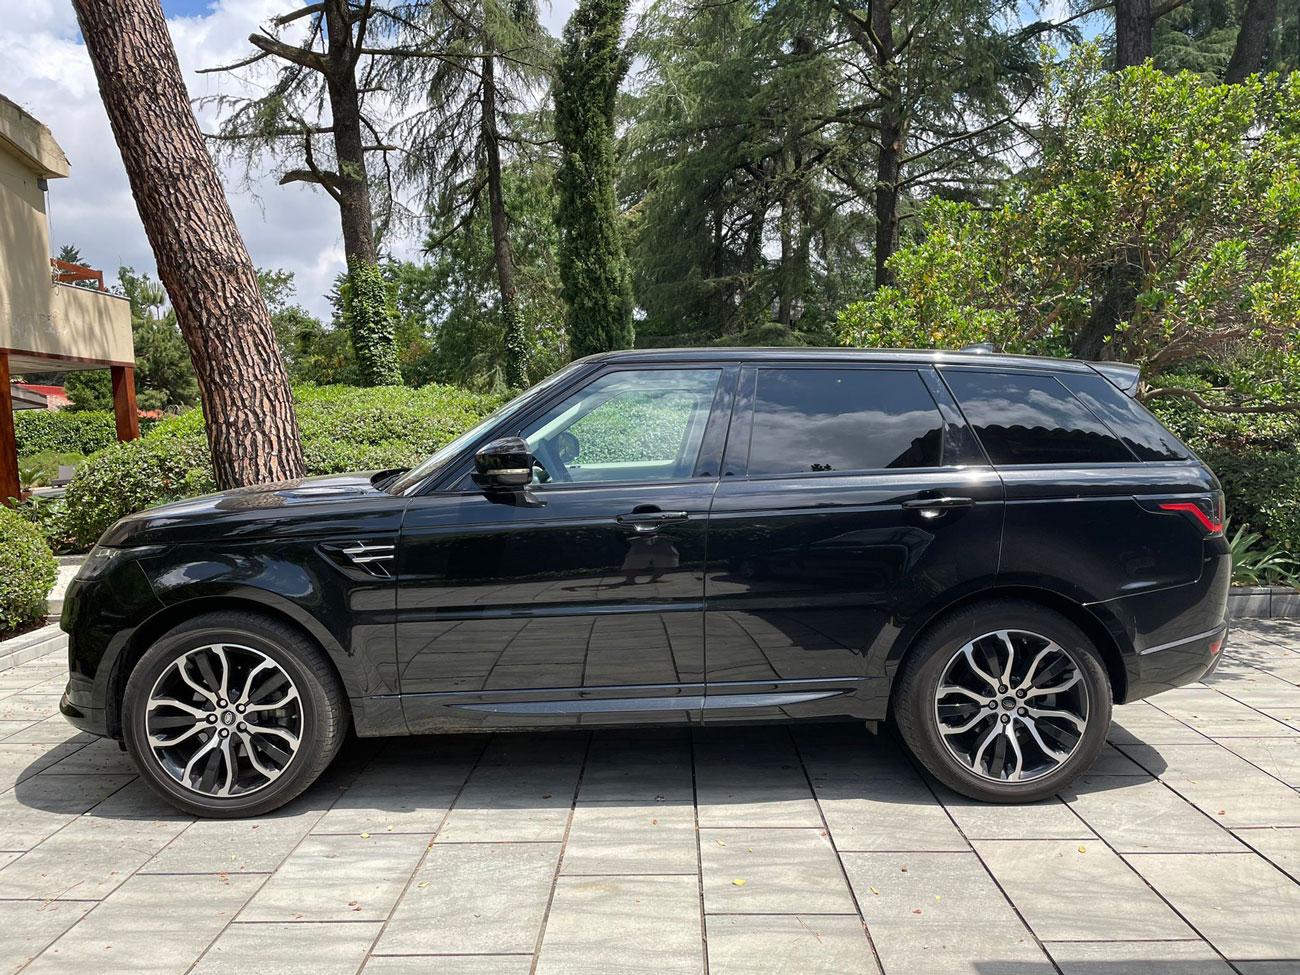 Range-Rover-Sport-Rental-Ibiza-2